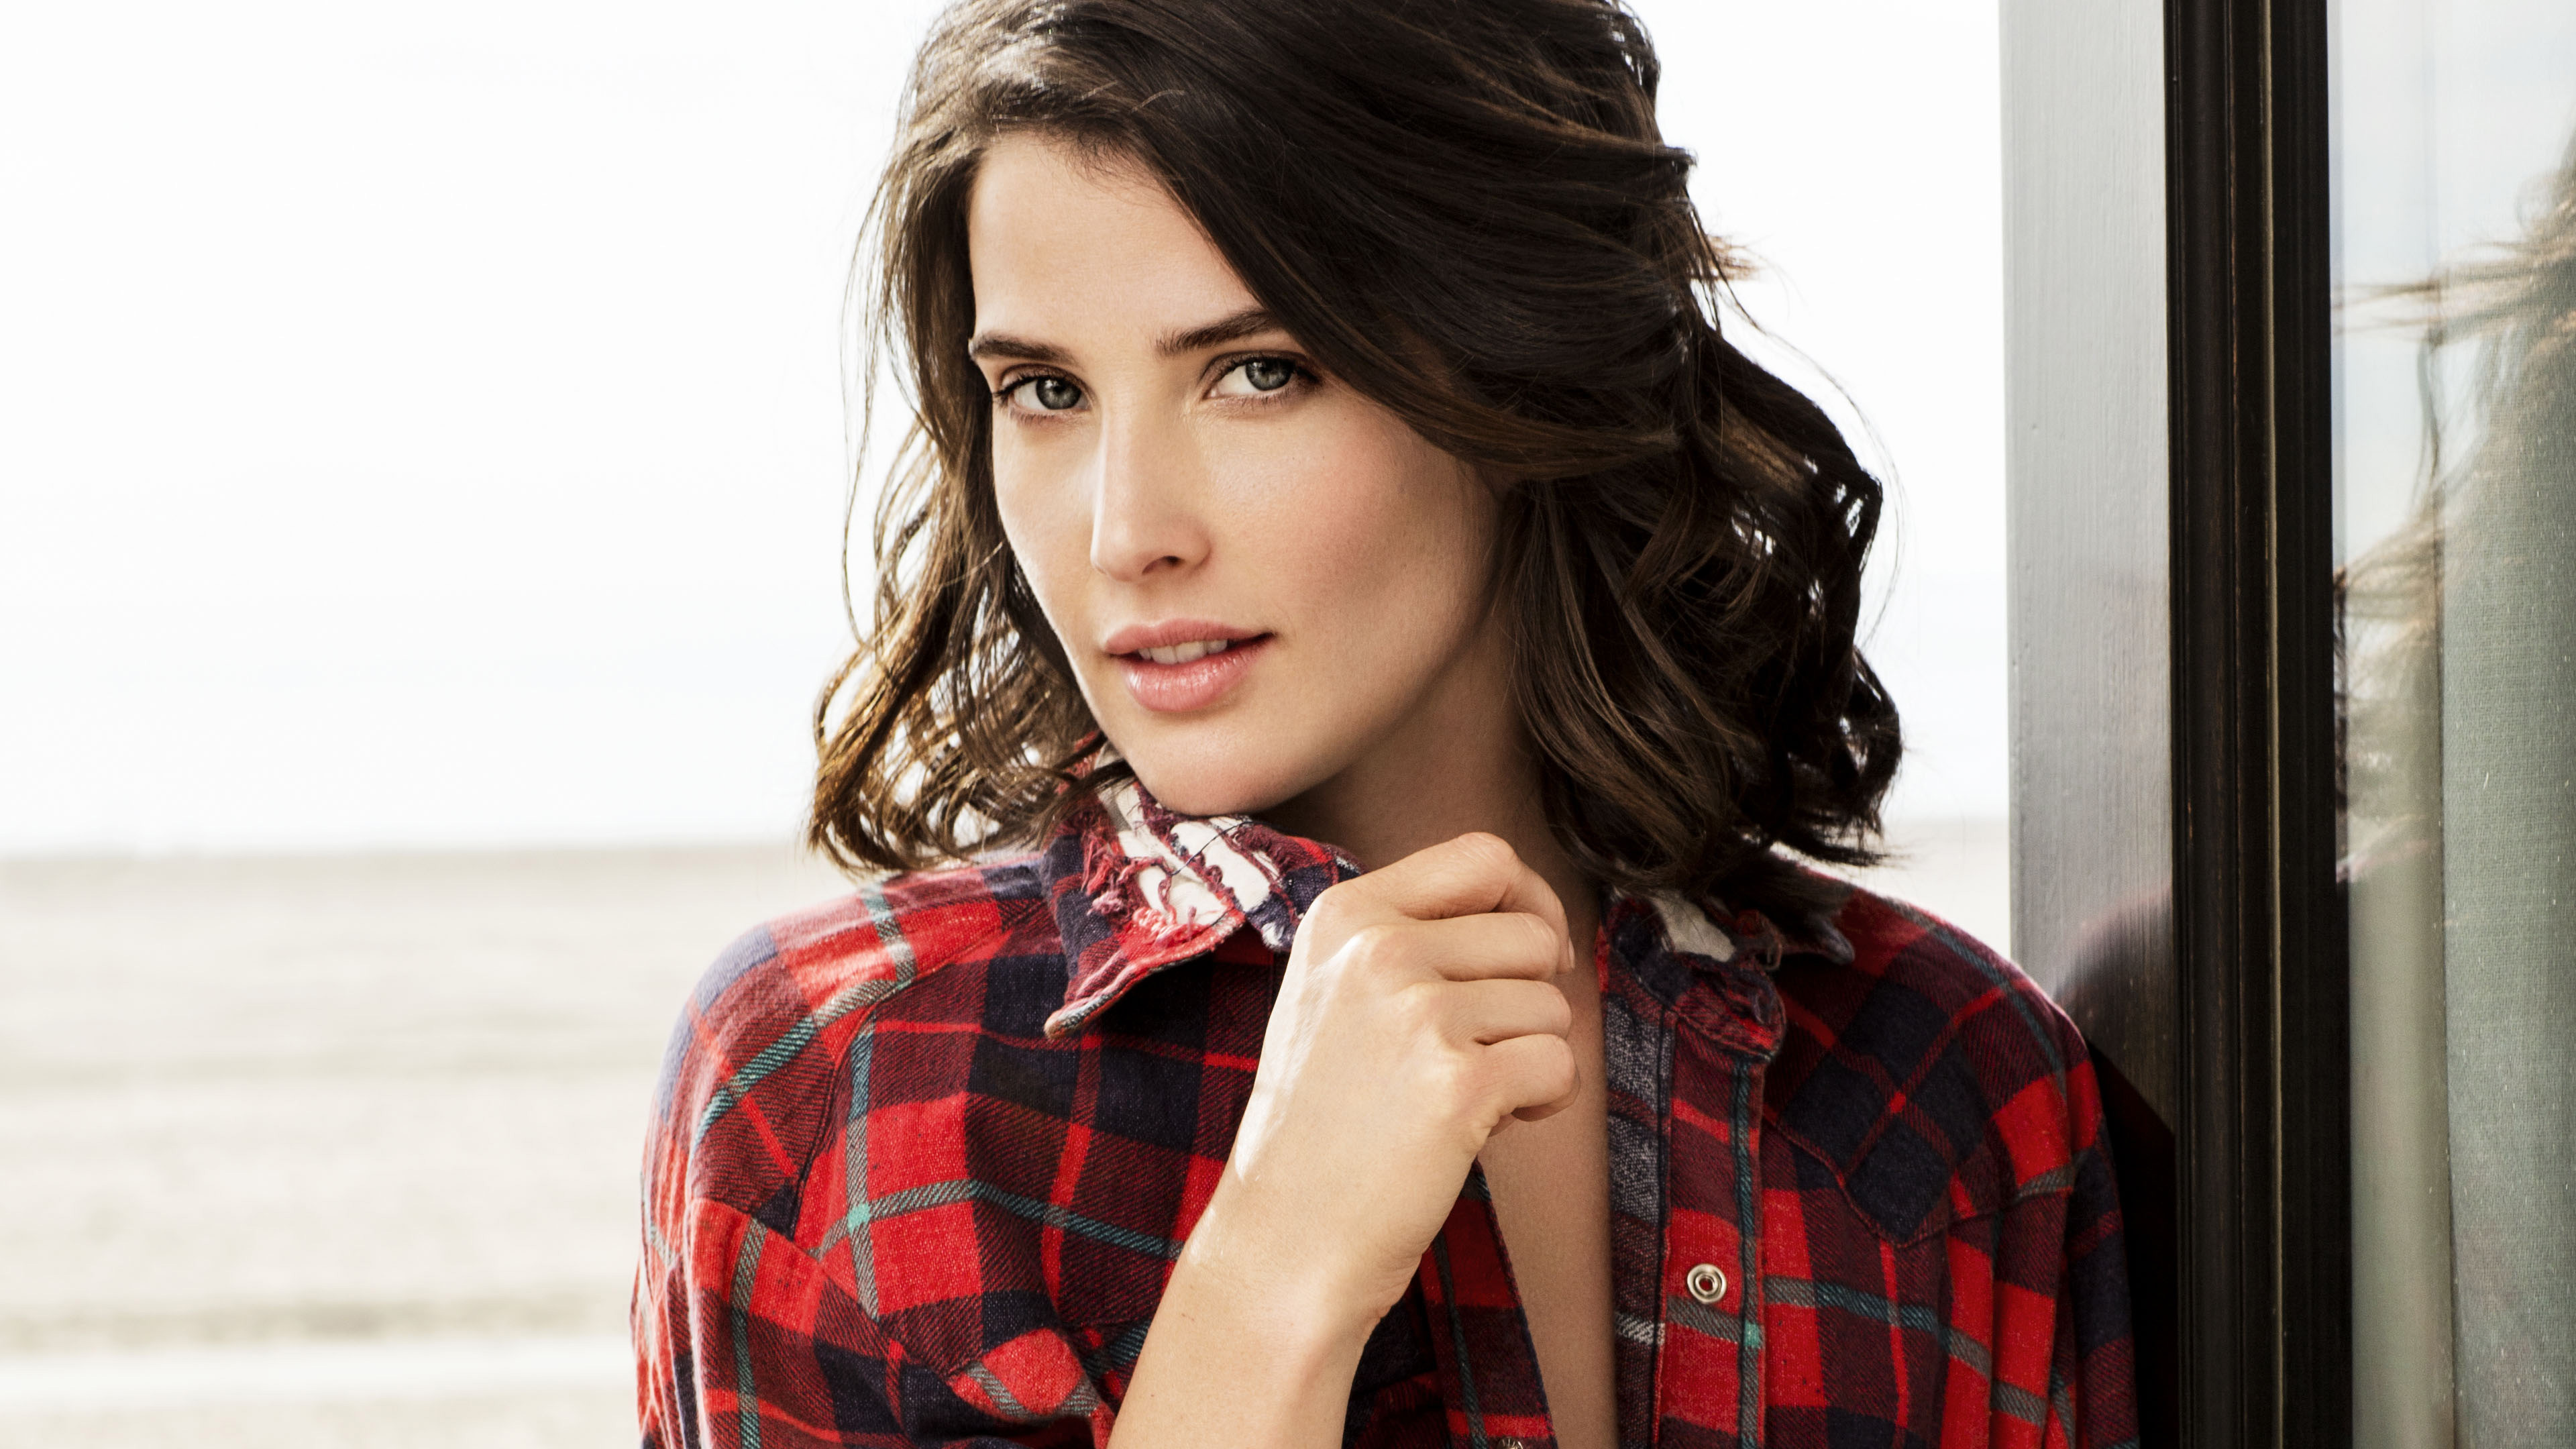 cobie smulders 2019 1536949166 - Cobie Smulders 2019 - hd-wallpapers, girls wallpapers, cobie smulders wallpapers, celebrities wallpapers, 4k-wallpapers